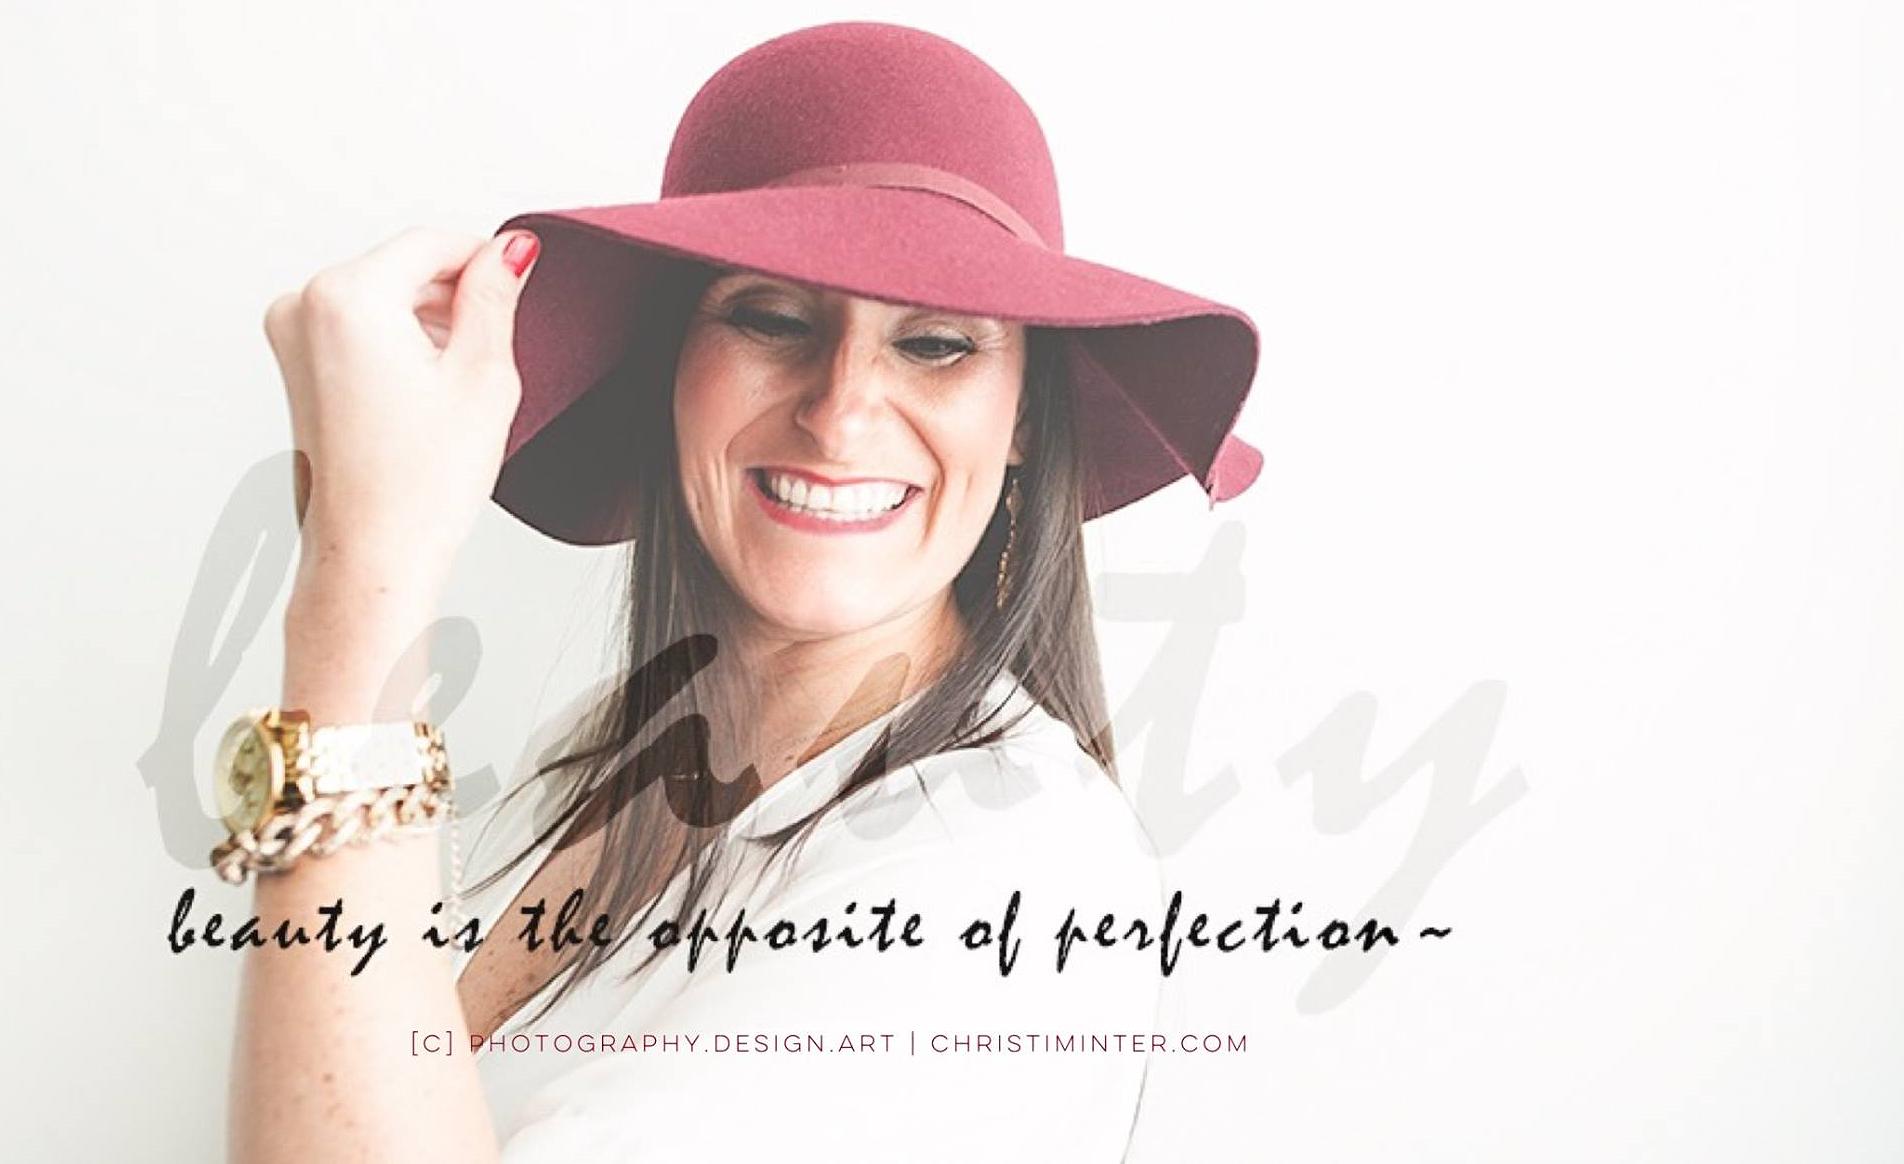 christiminter.com+beauty+photography+fashion+design